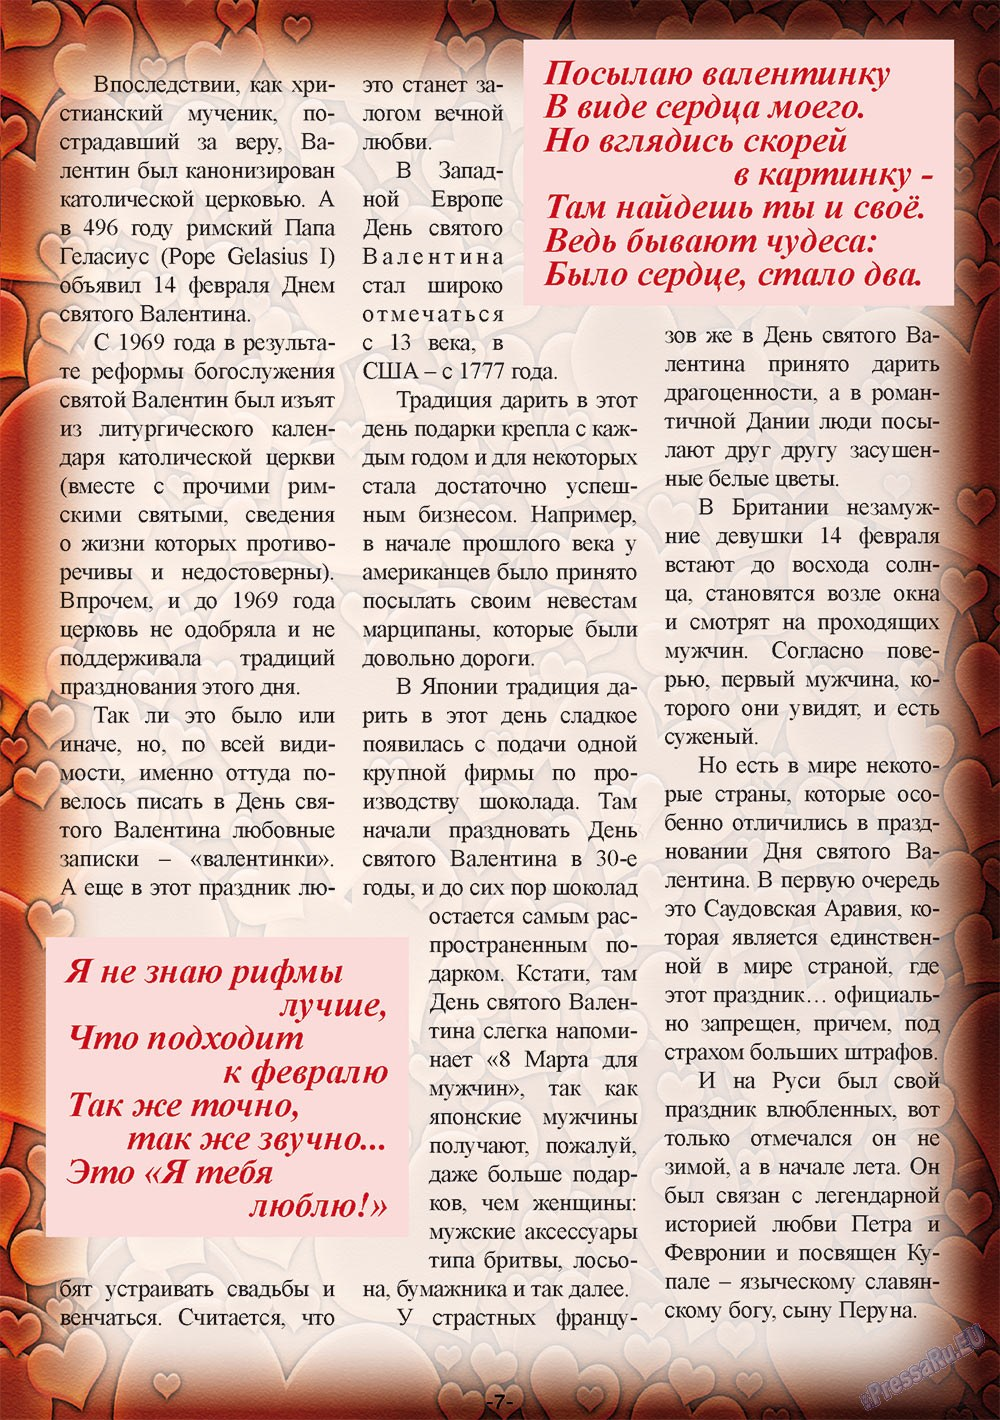 ExPress (журнал). 2012 год, номер 2, стр. 7